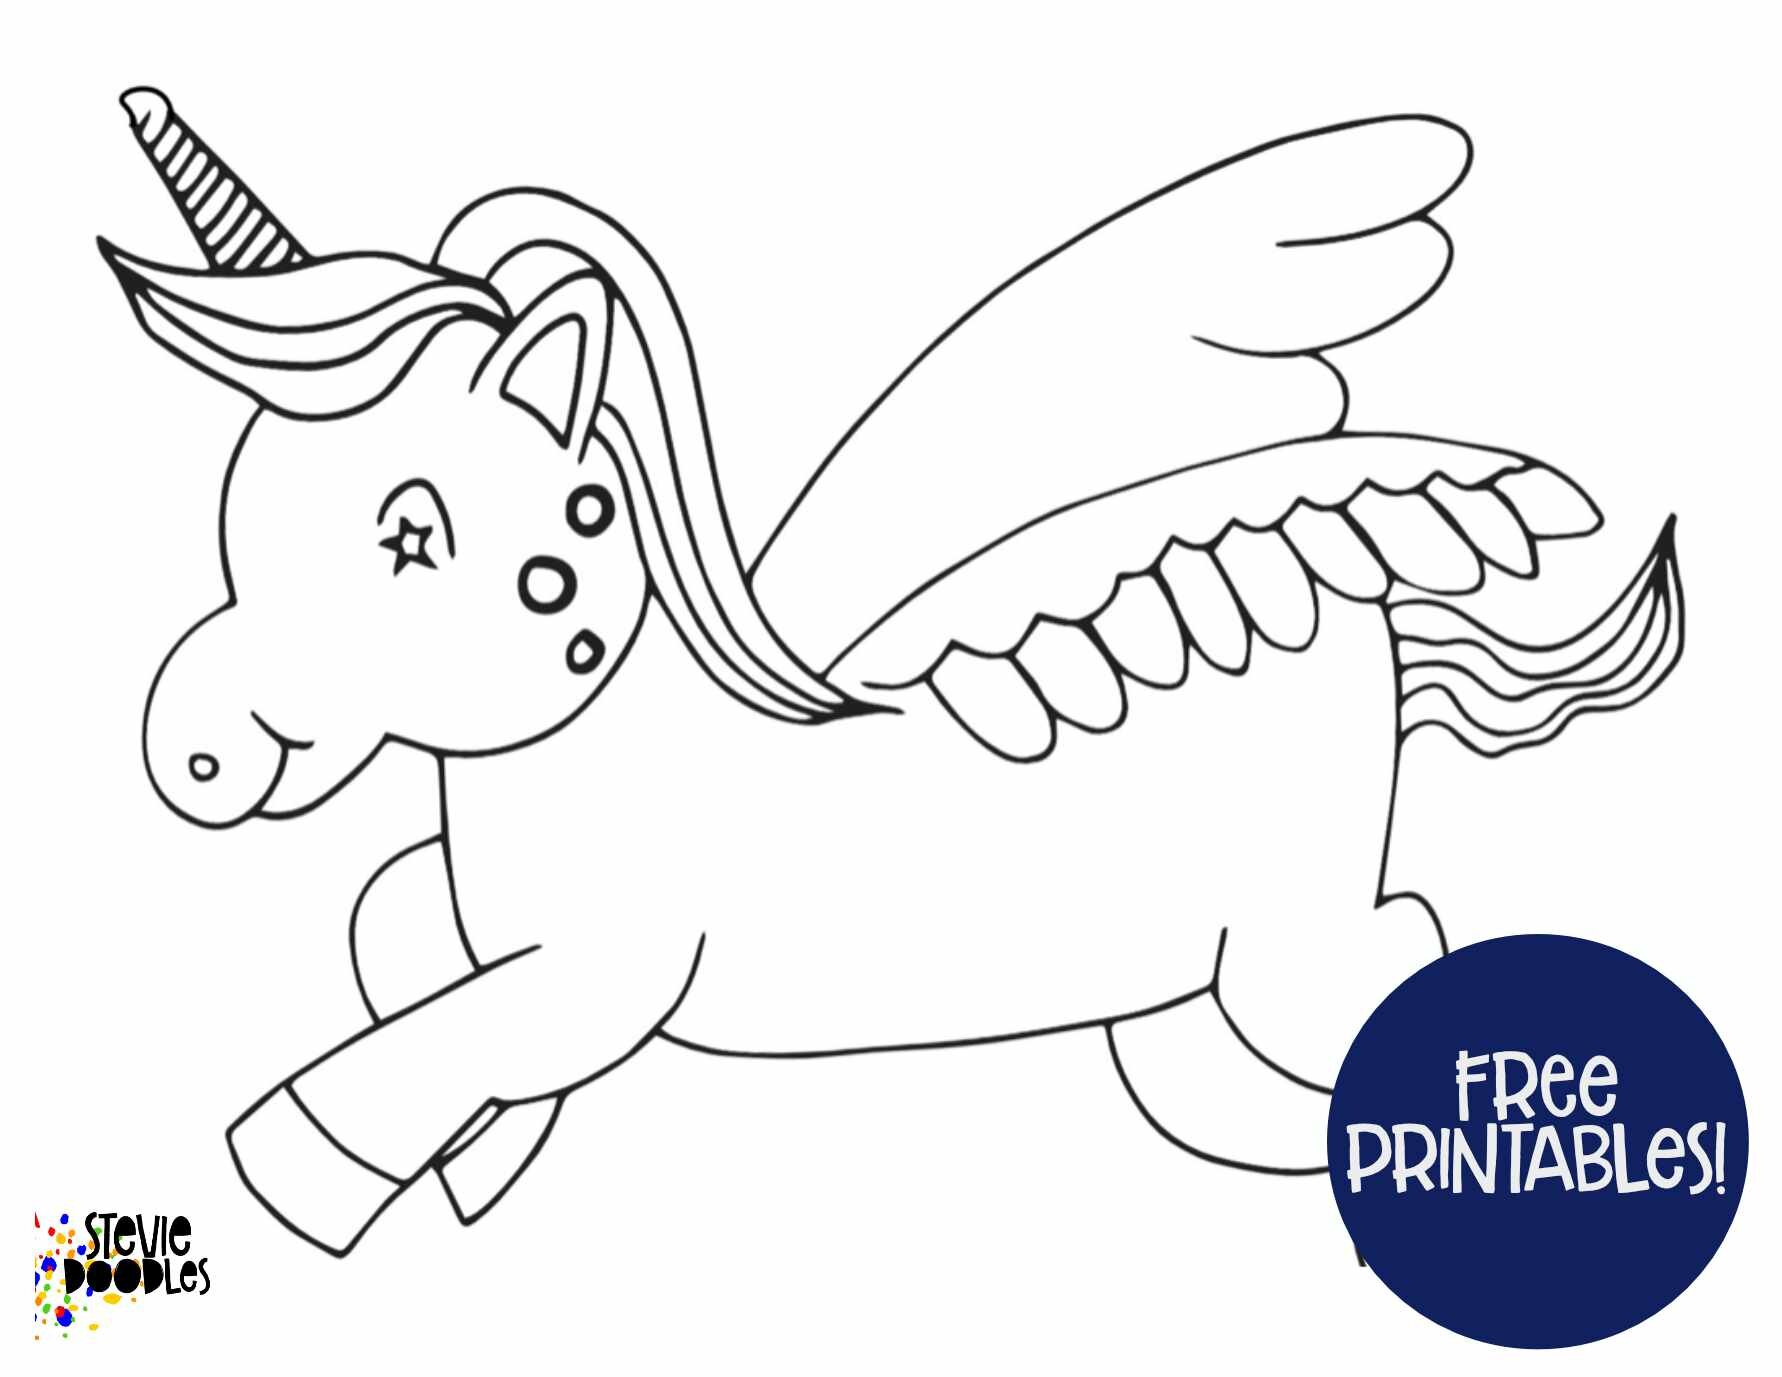 Free Printable Unicorn Coloring Page - Simple Unicorn — Stevie Doodles